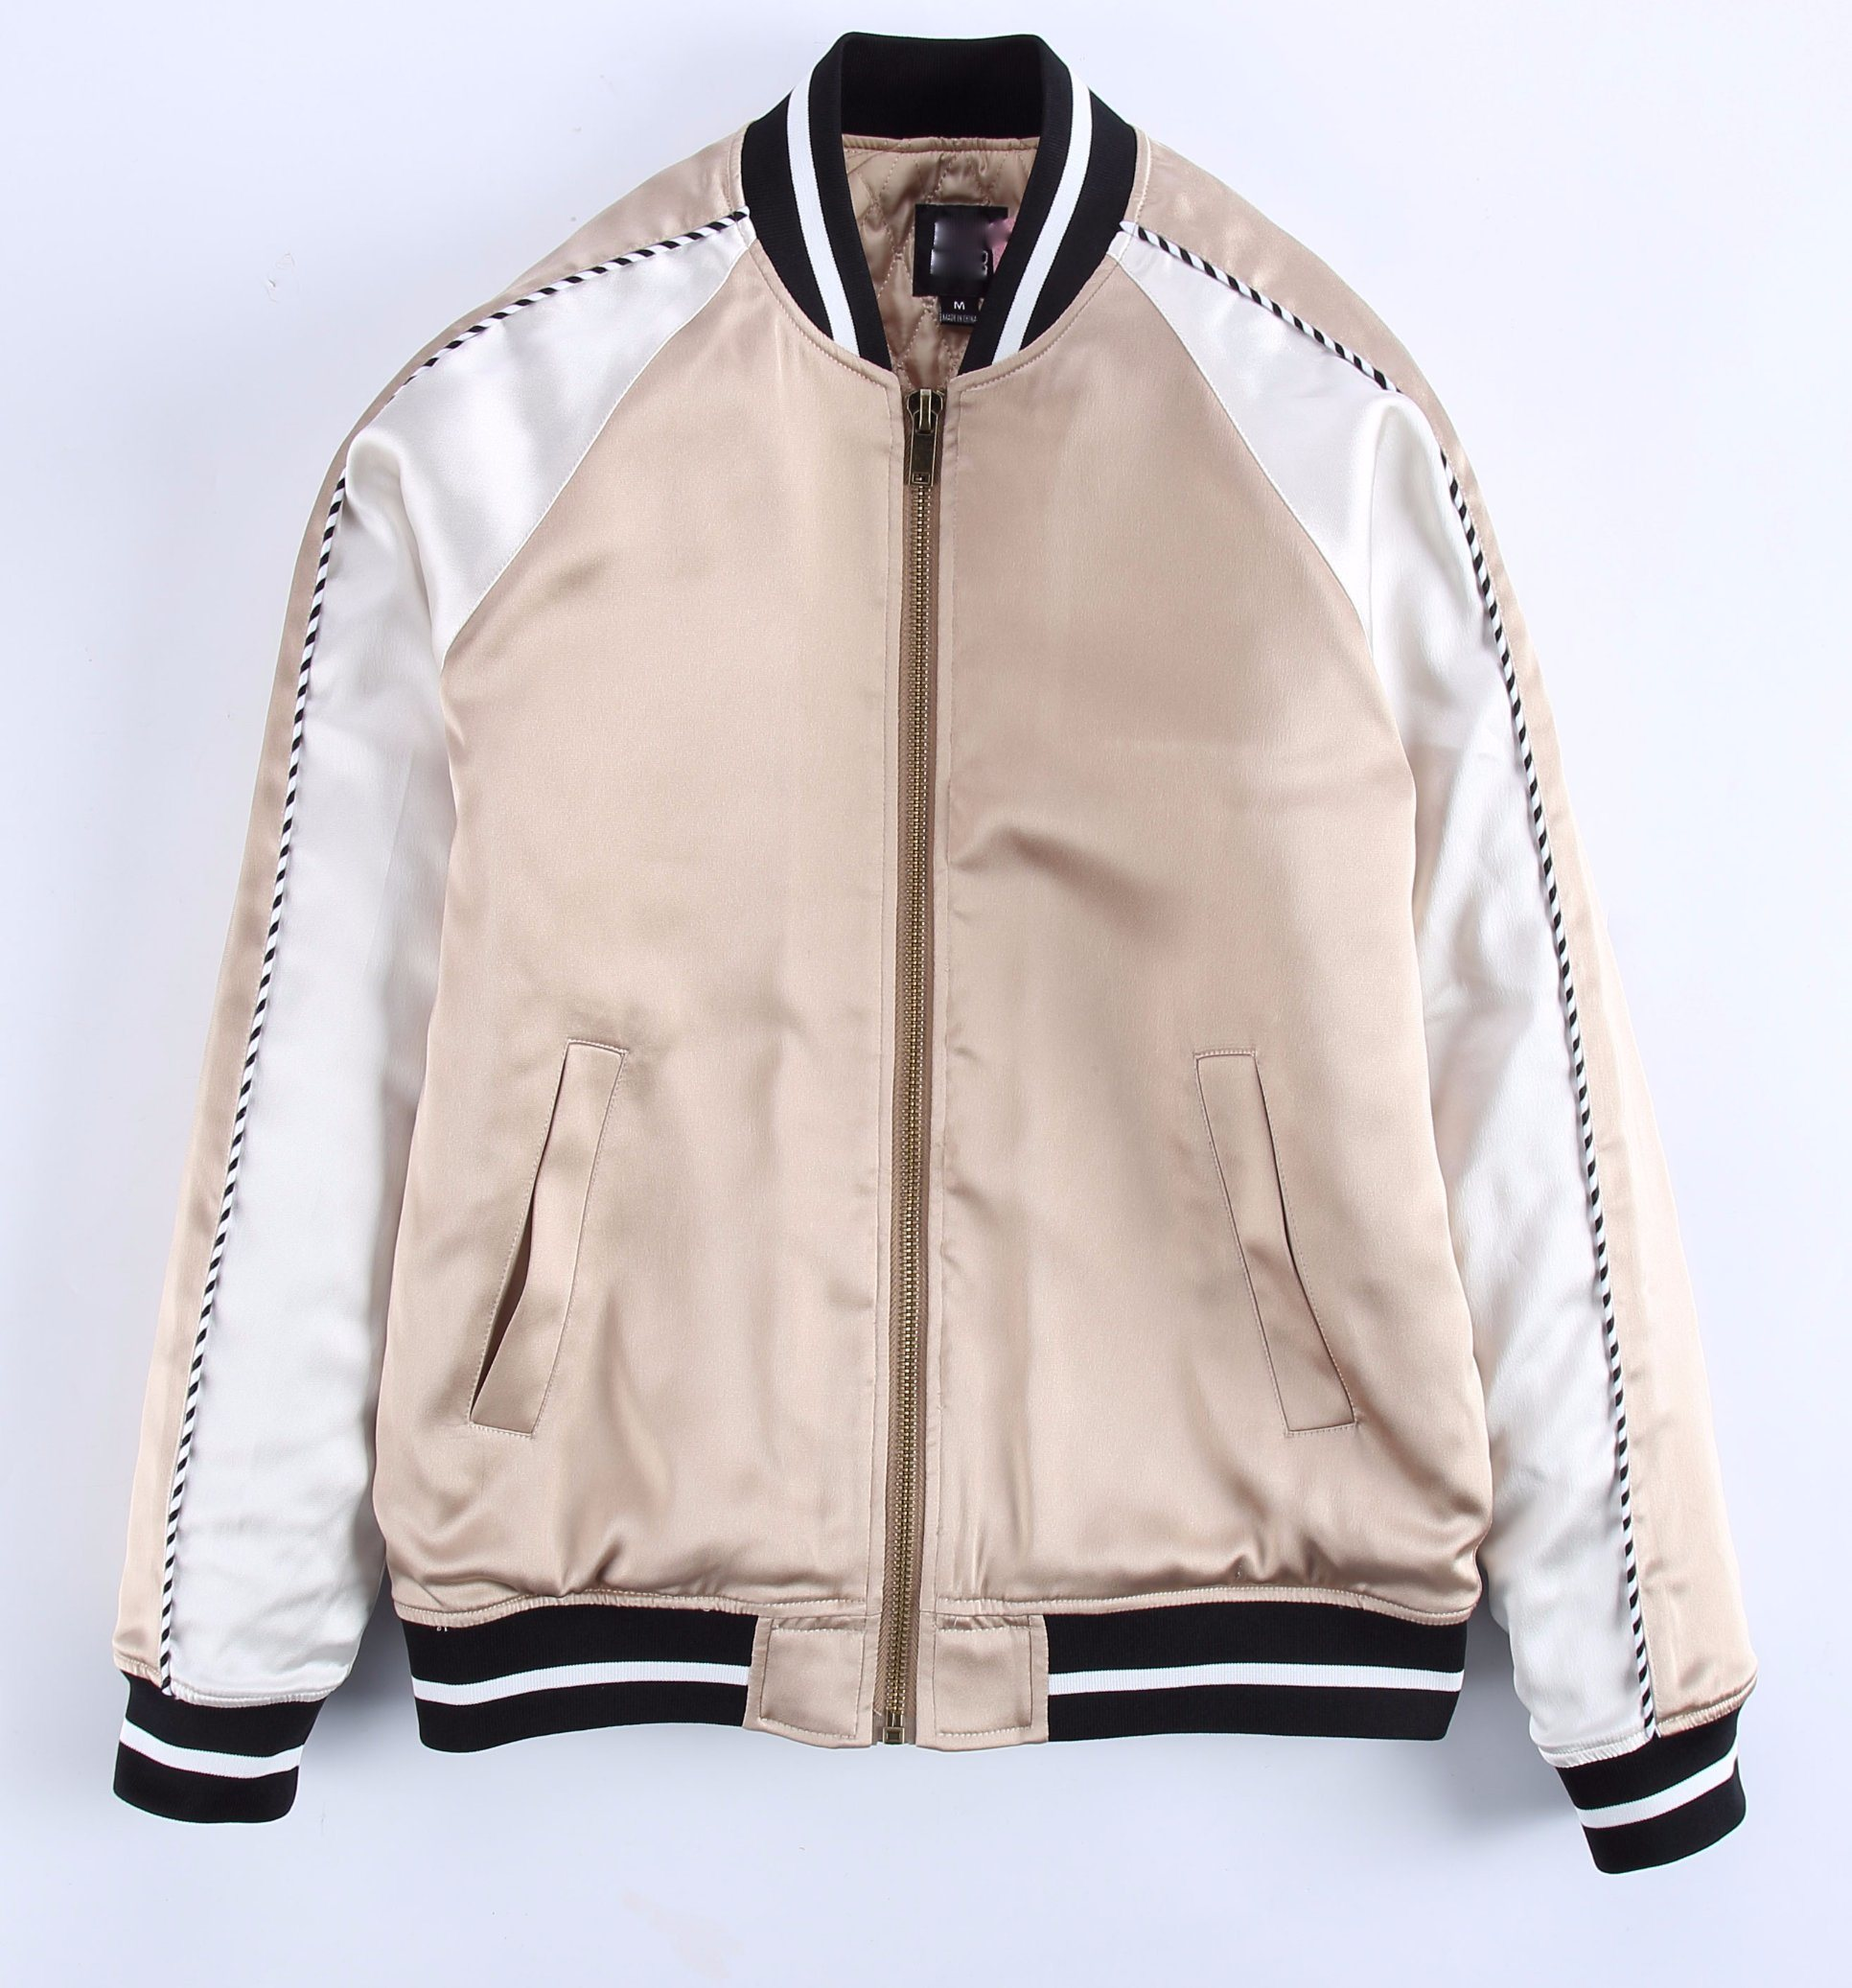 Fashion New Design Men′s Winter Padding Jacket Coat